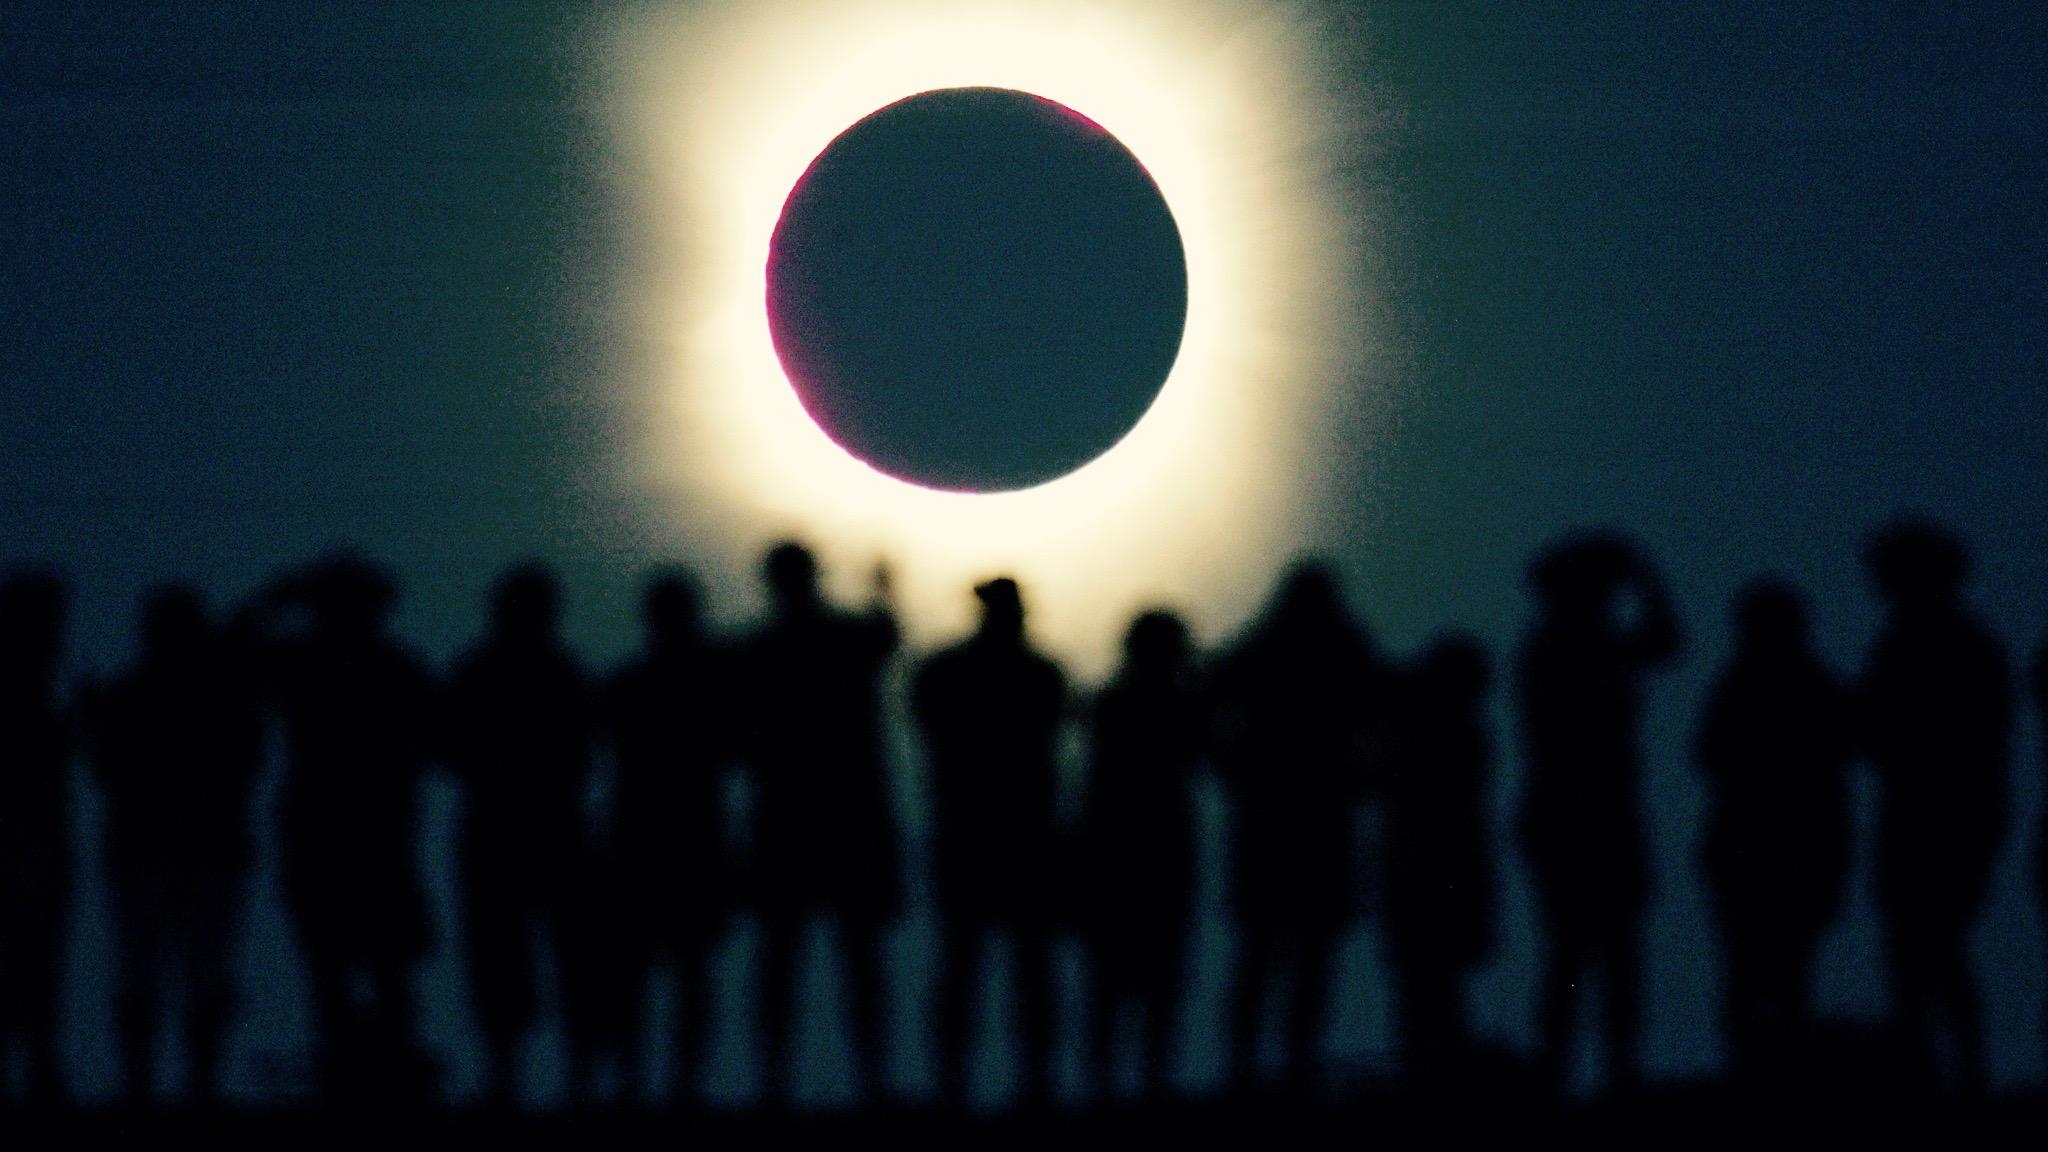 Solar eclipse myths persist despite scientific evidence disproving